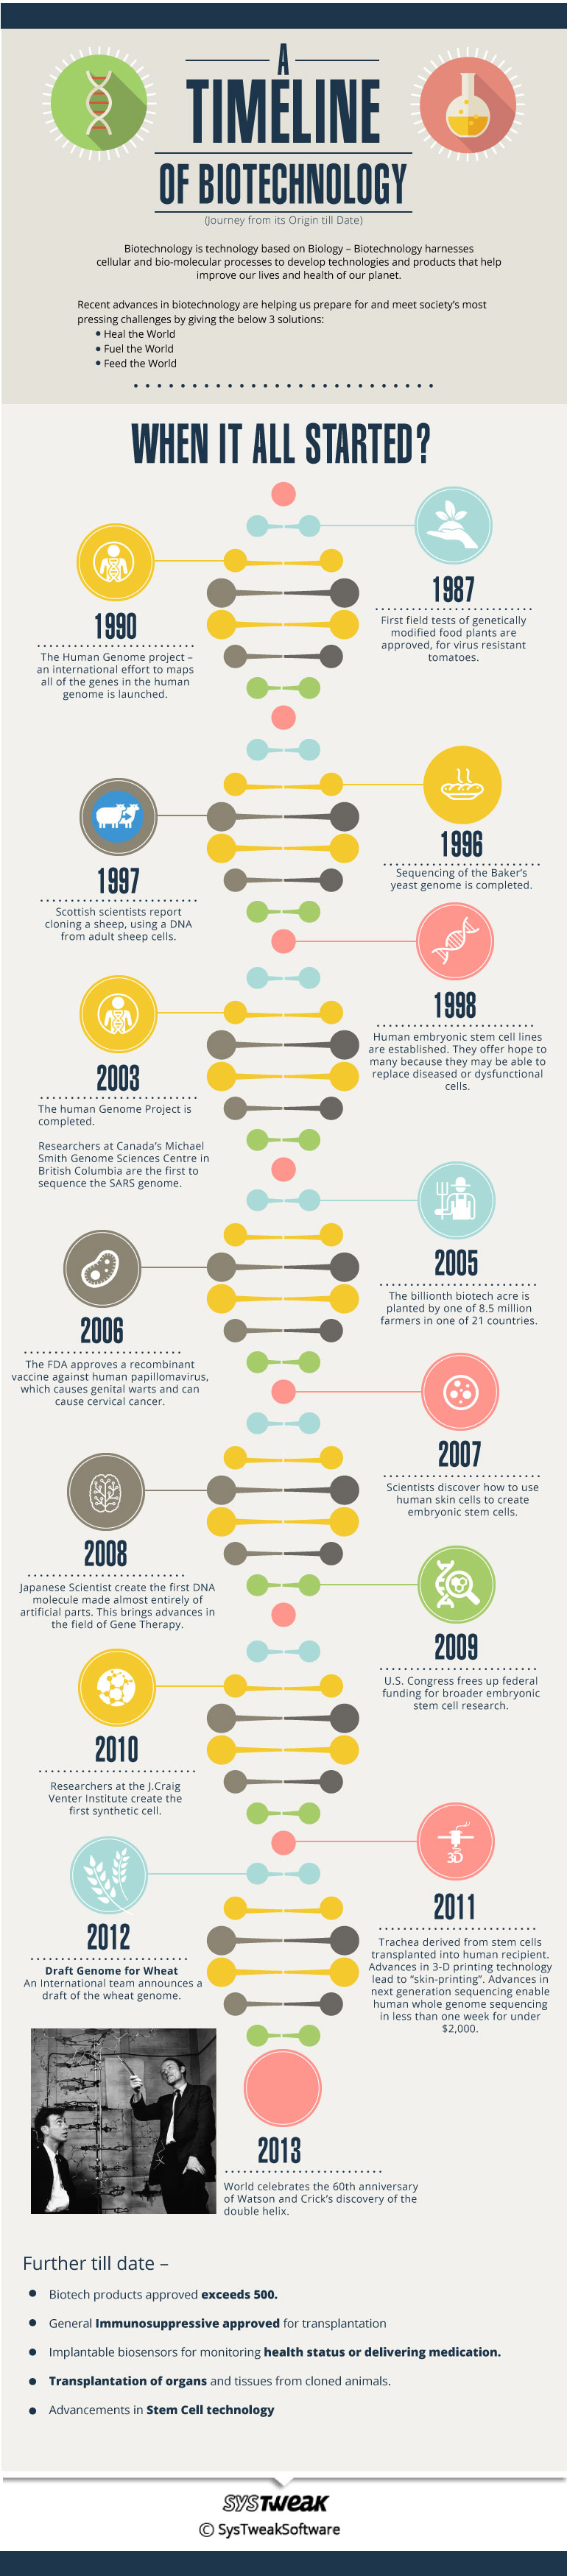 timeline-biotechnology2